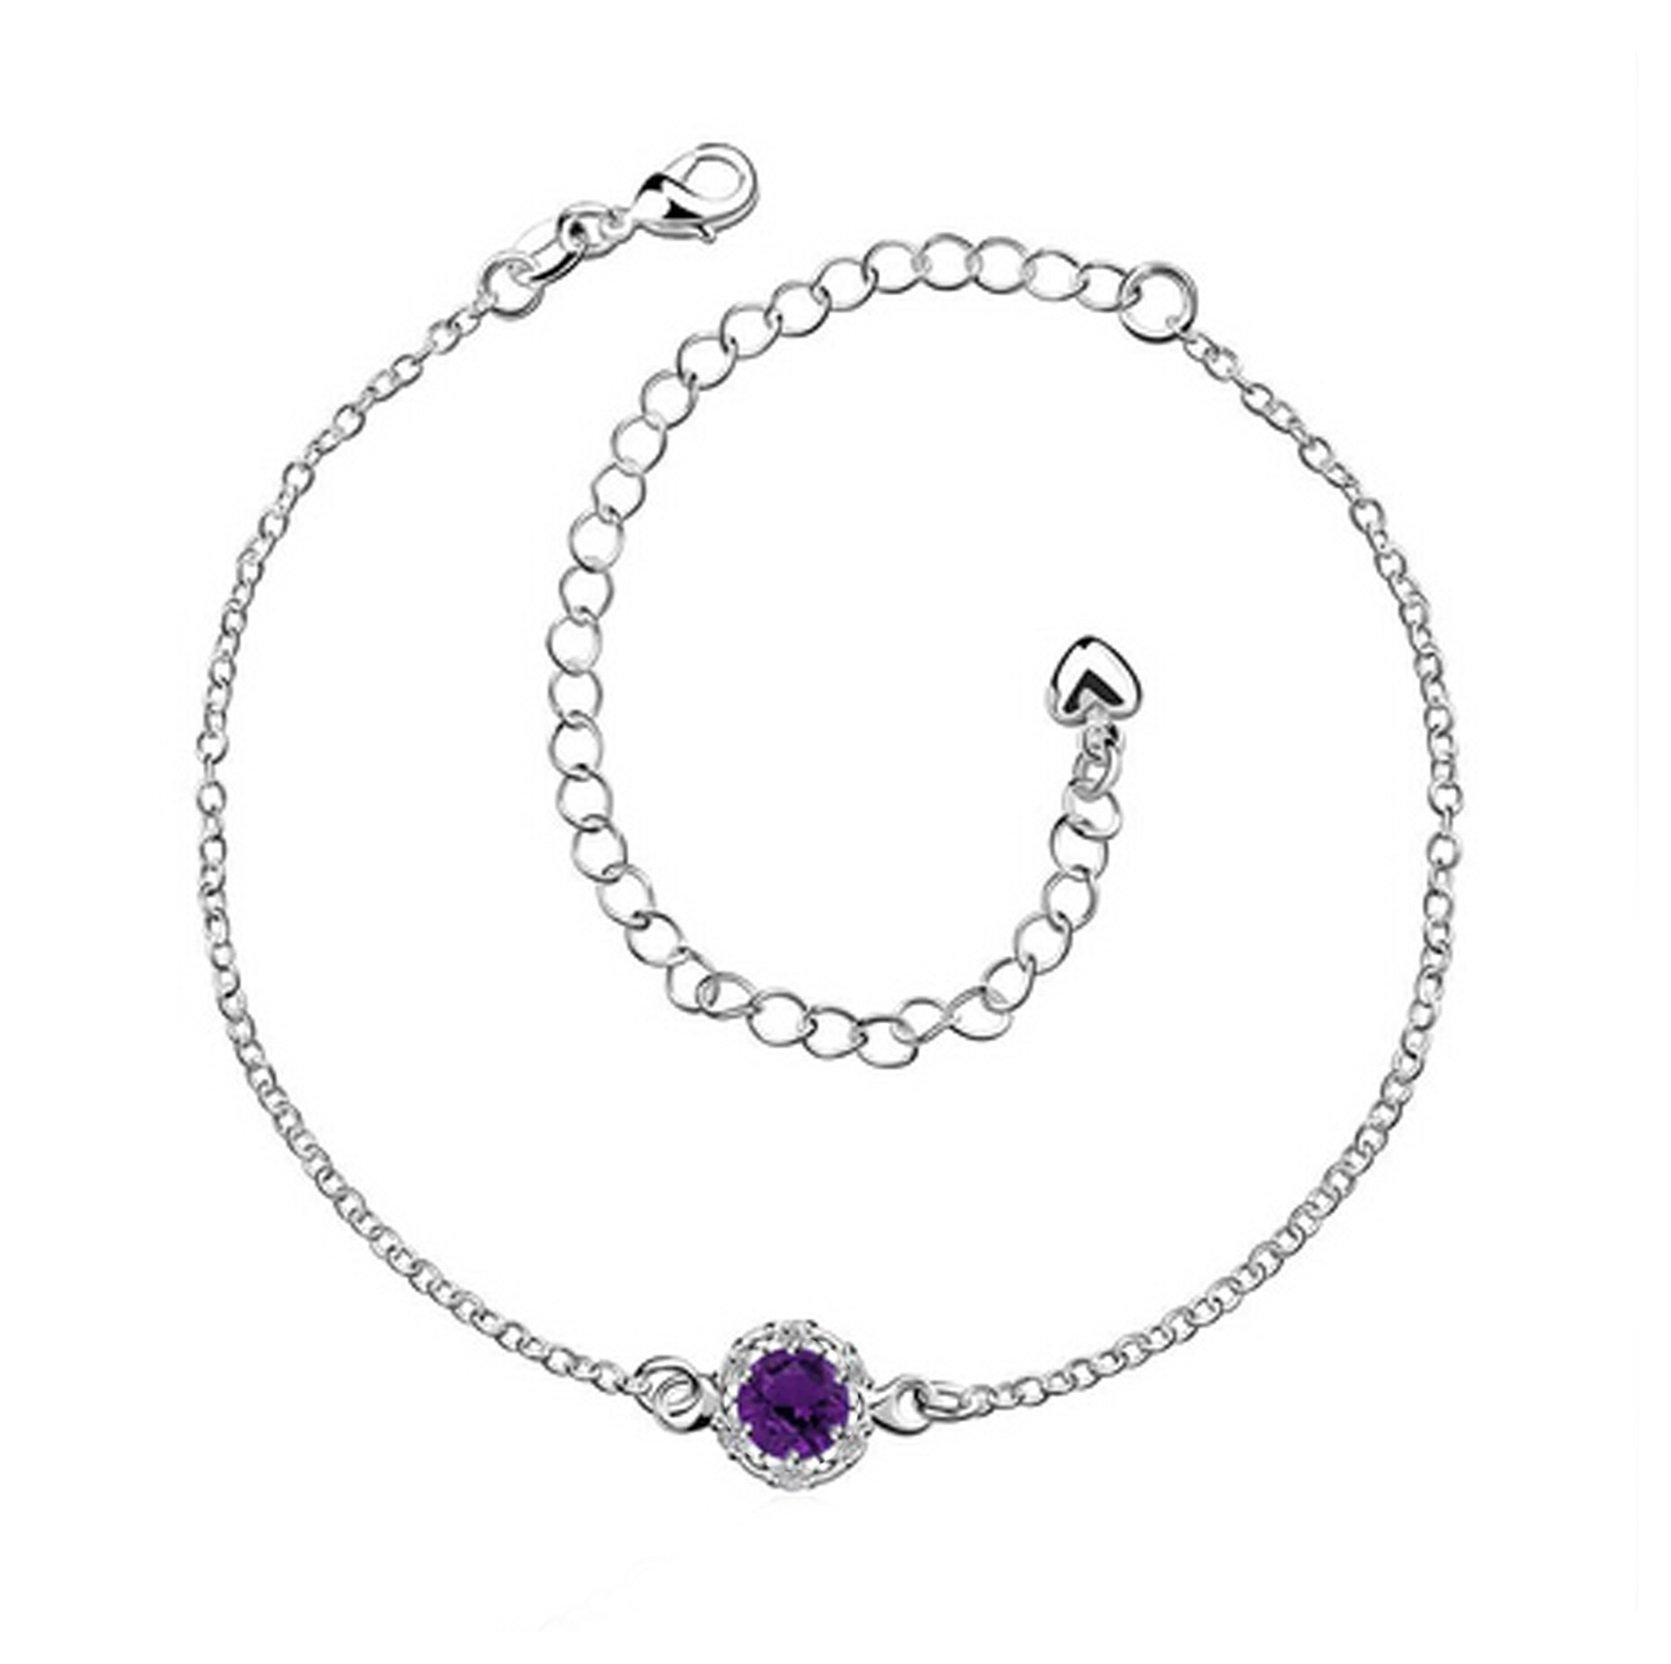 Aokarry Women's Chain Anklet Bracelet, Flower Purple Cubic Zirconia Crystal Chain Extender, 20CM